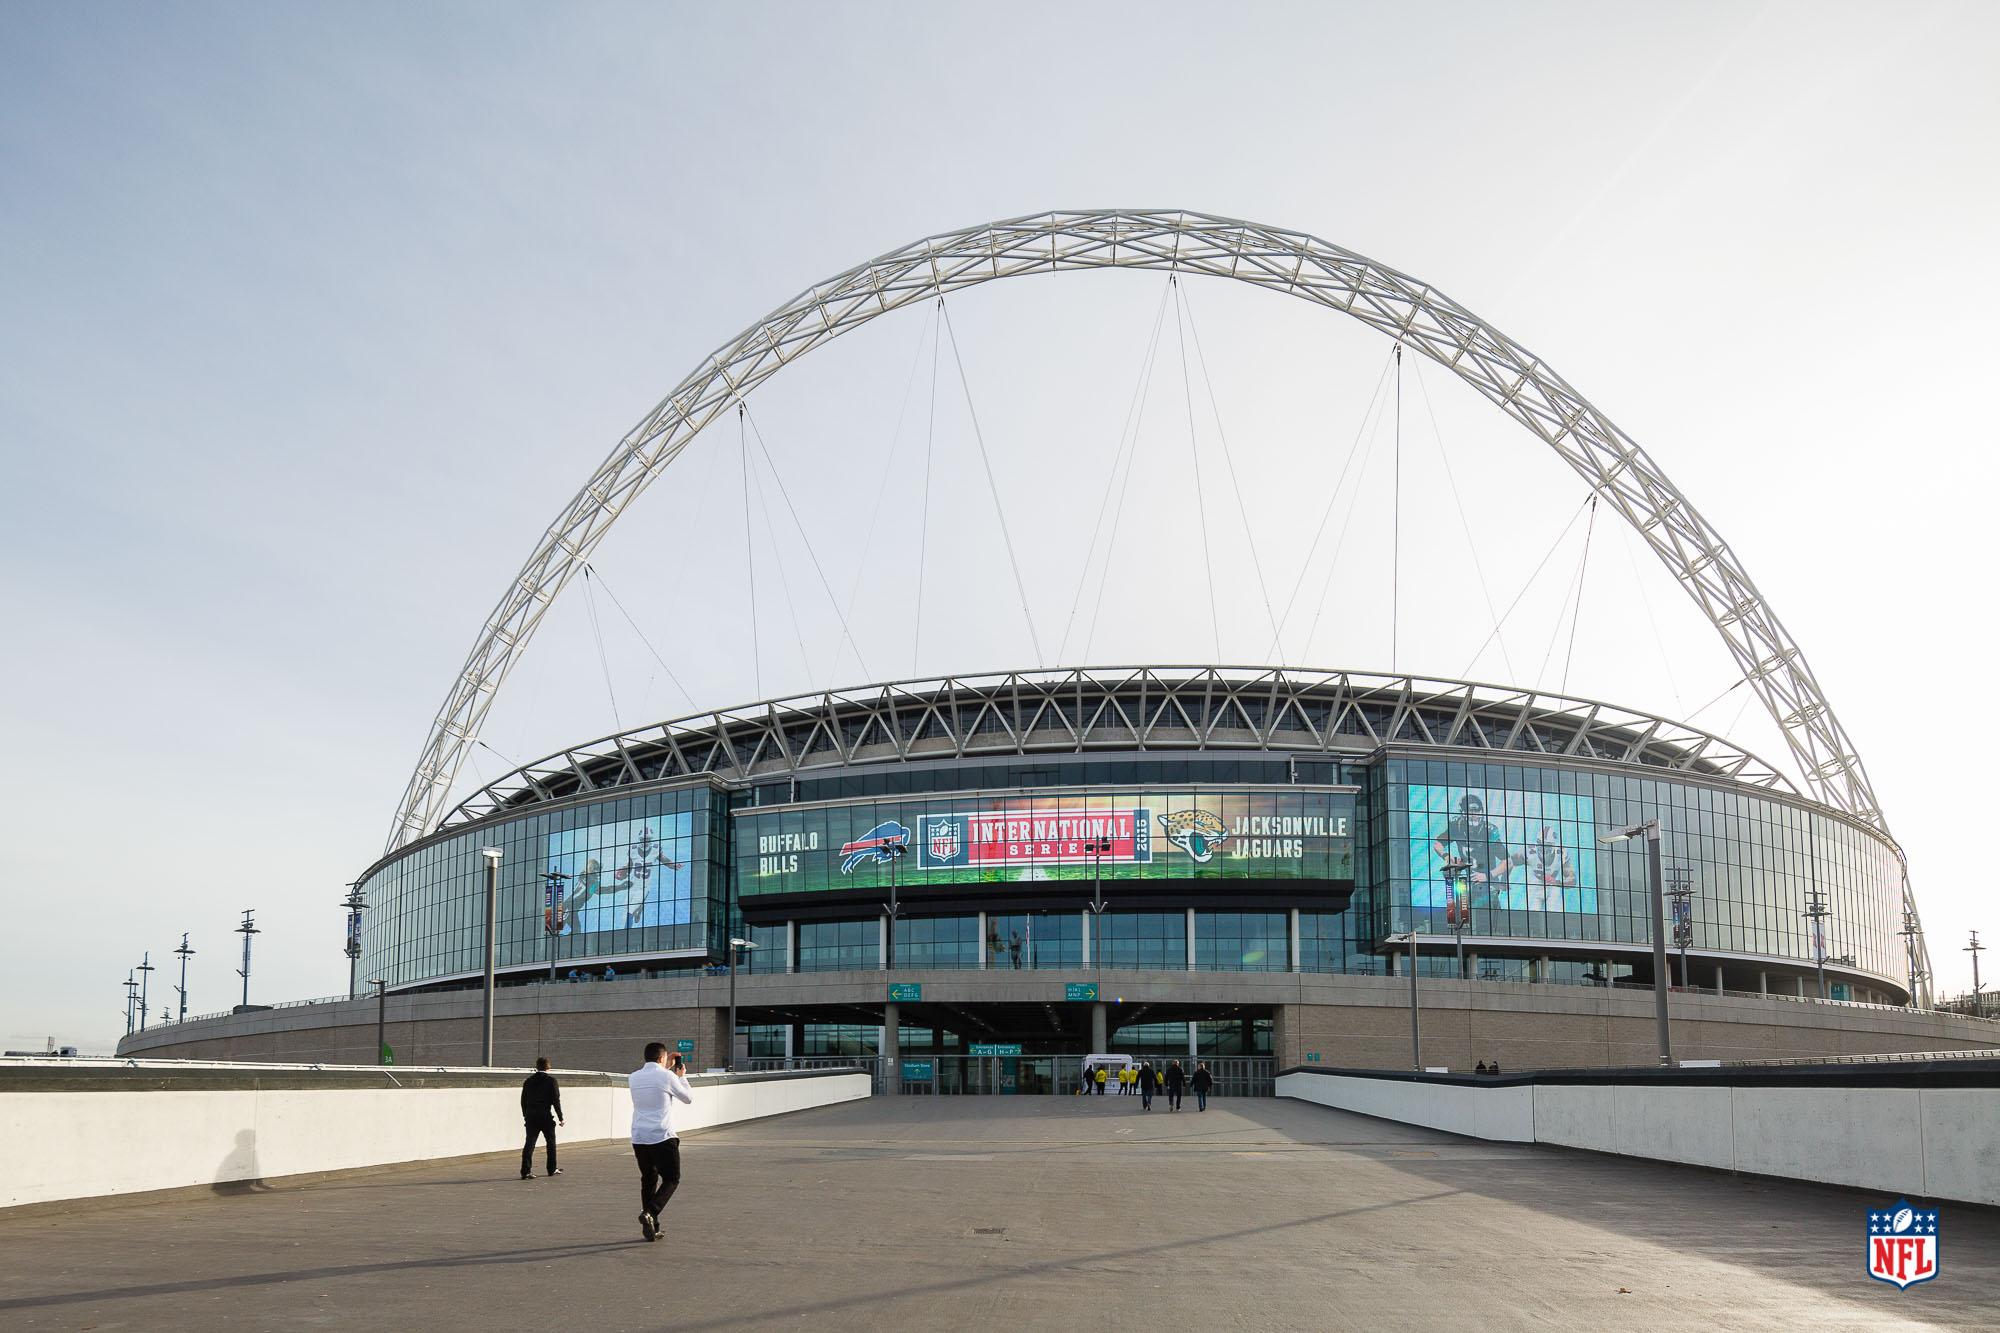 002_151025_London_Wembley_Game13_Decor_244004.jpg